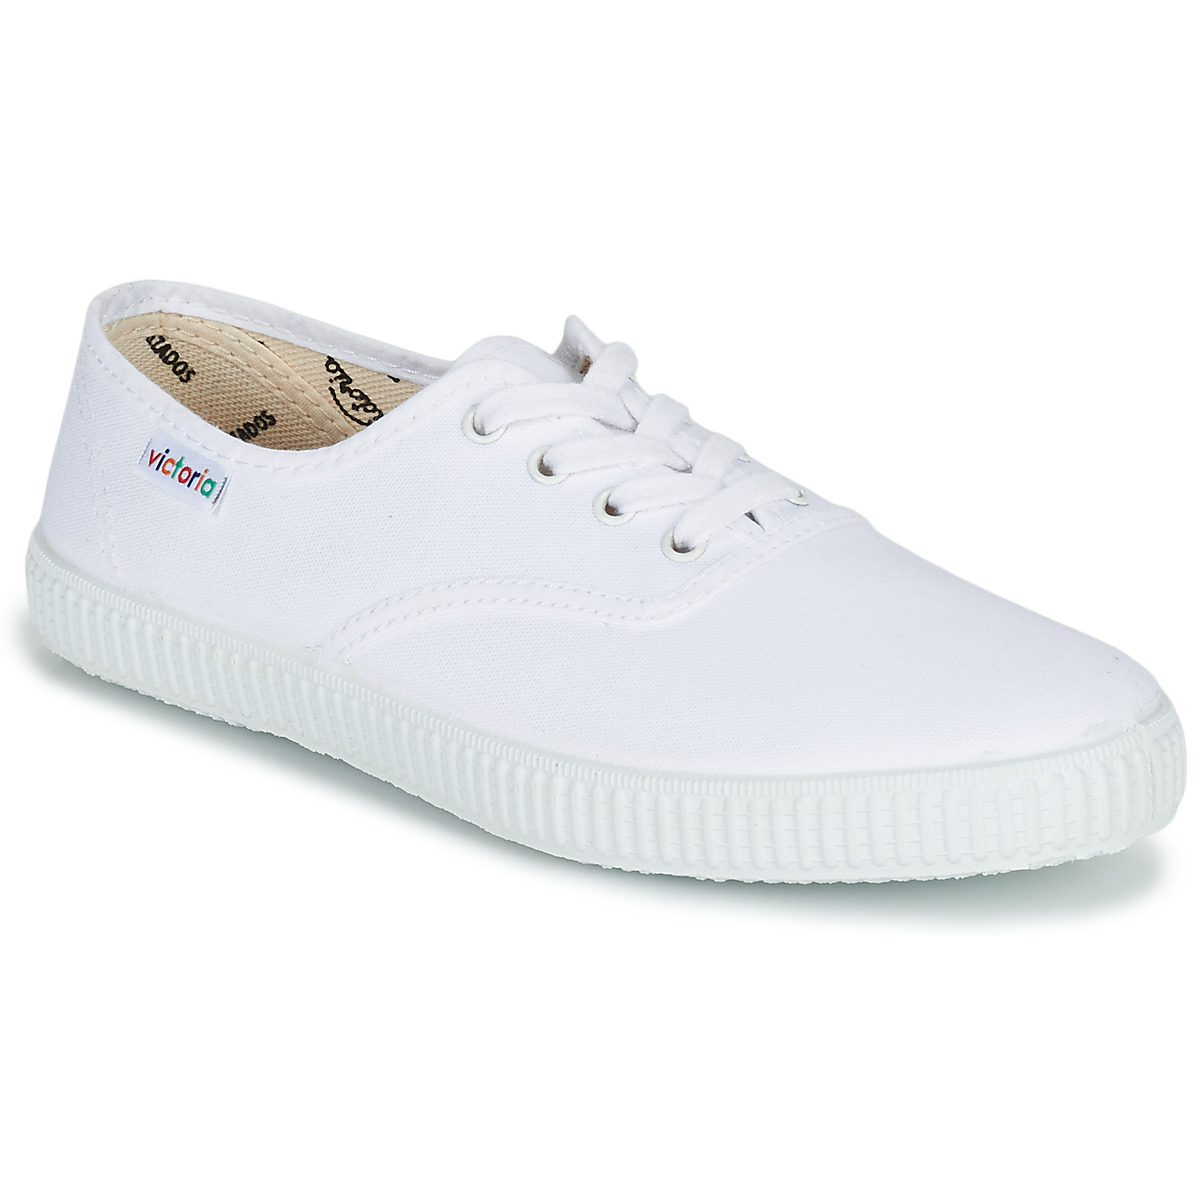 GratuiteSpartoo Chaussures Chaussures Victoria Livraison Victoria Livraison CxWEQrBoed